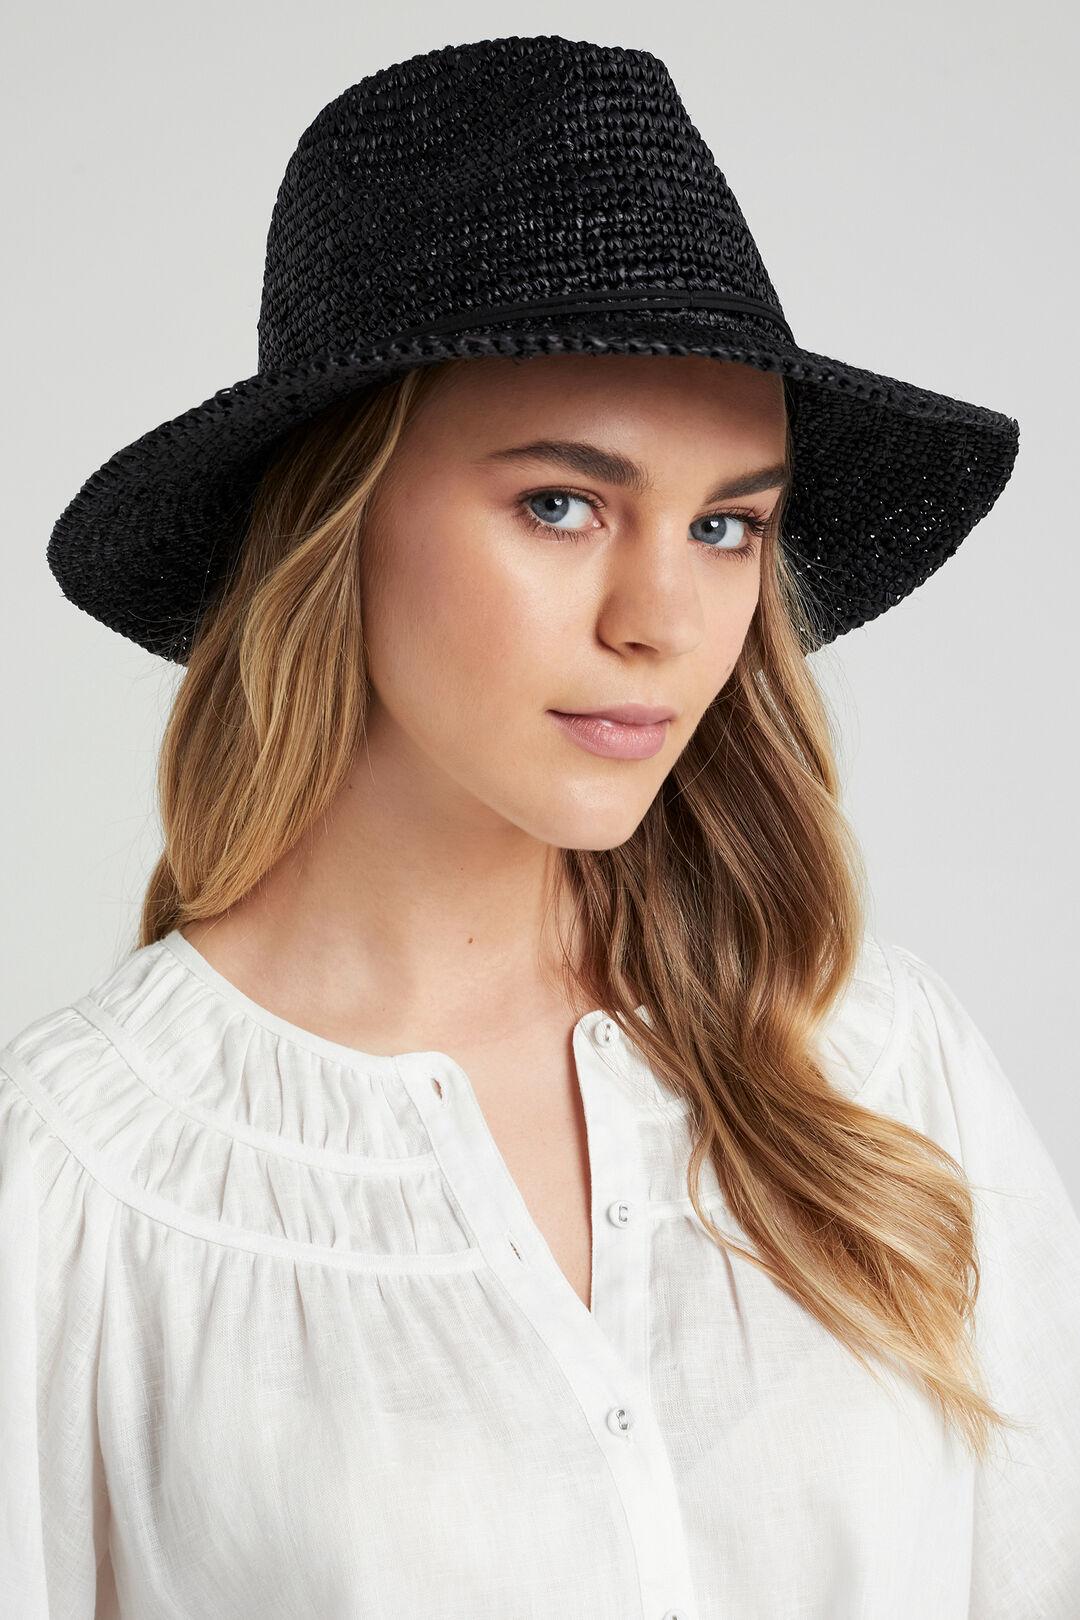 WIDE BRIM STRAW HAT  BLACK  hi-res